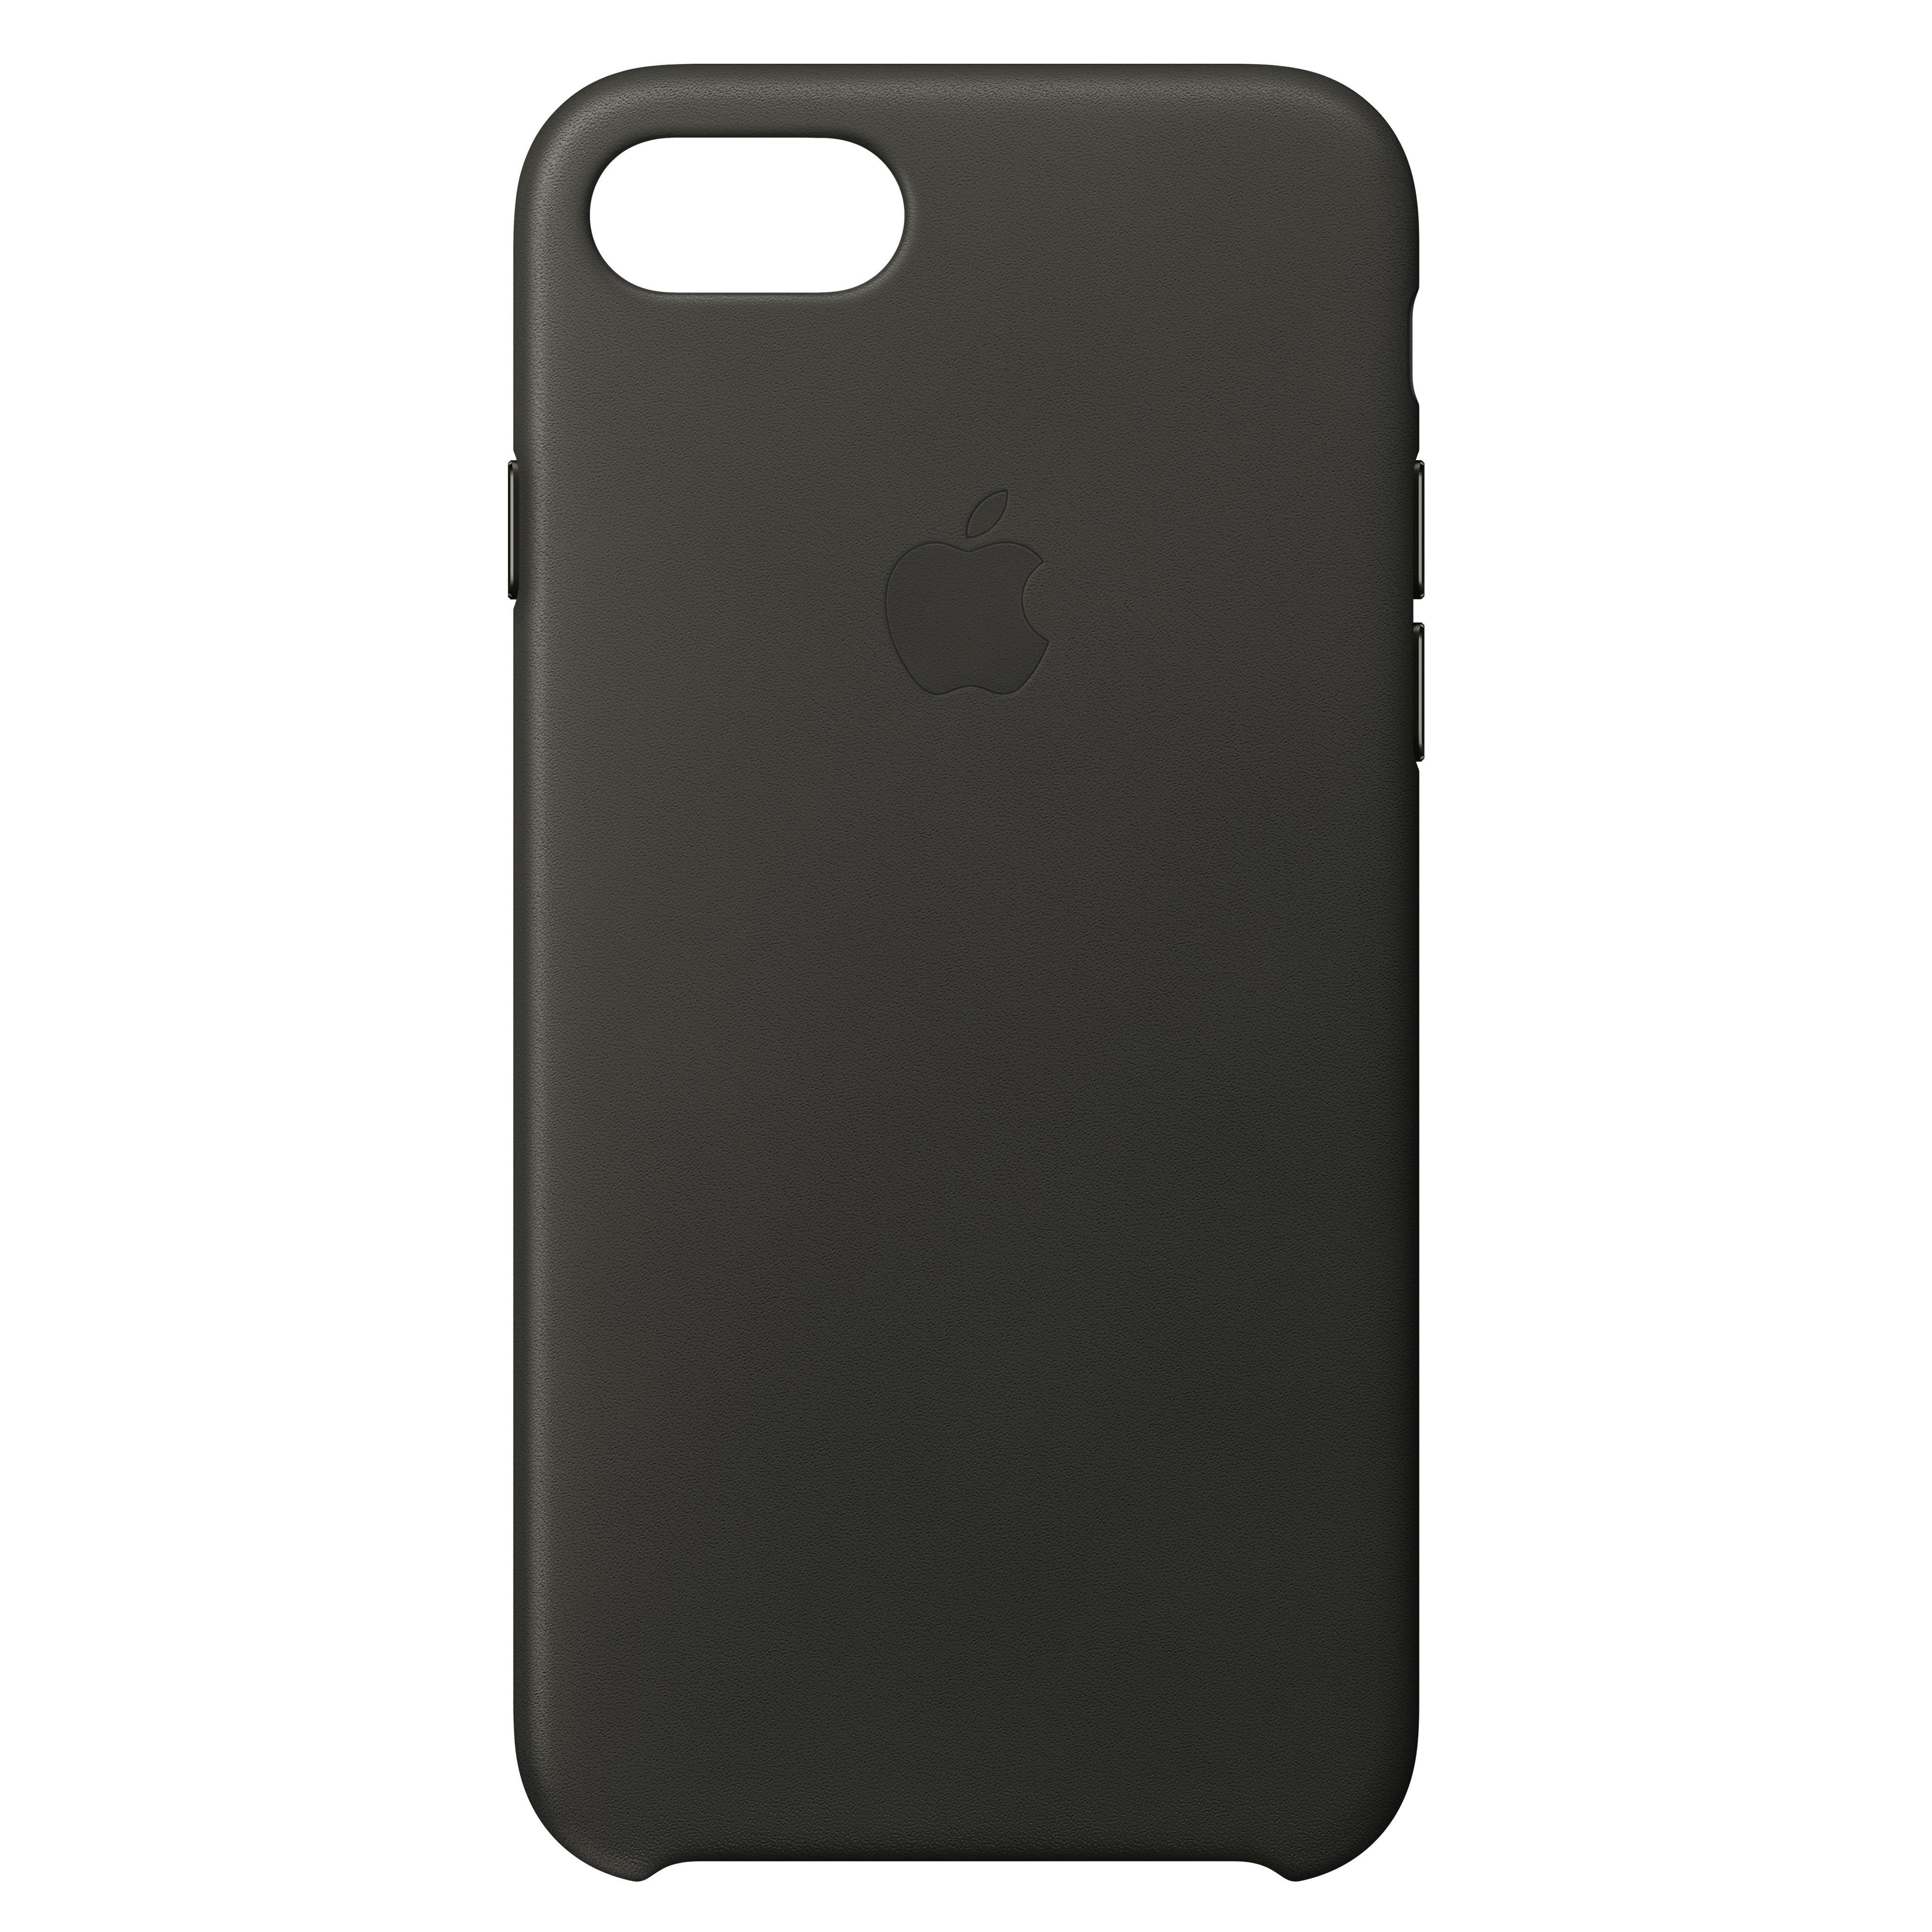 MQHC2ZM/A : iPhone 8 skinndeksel (koksgrå)